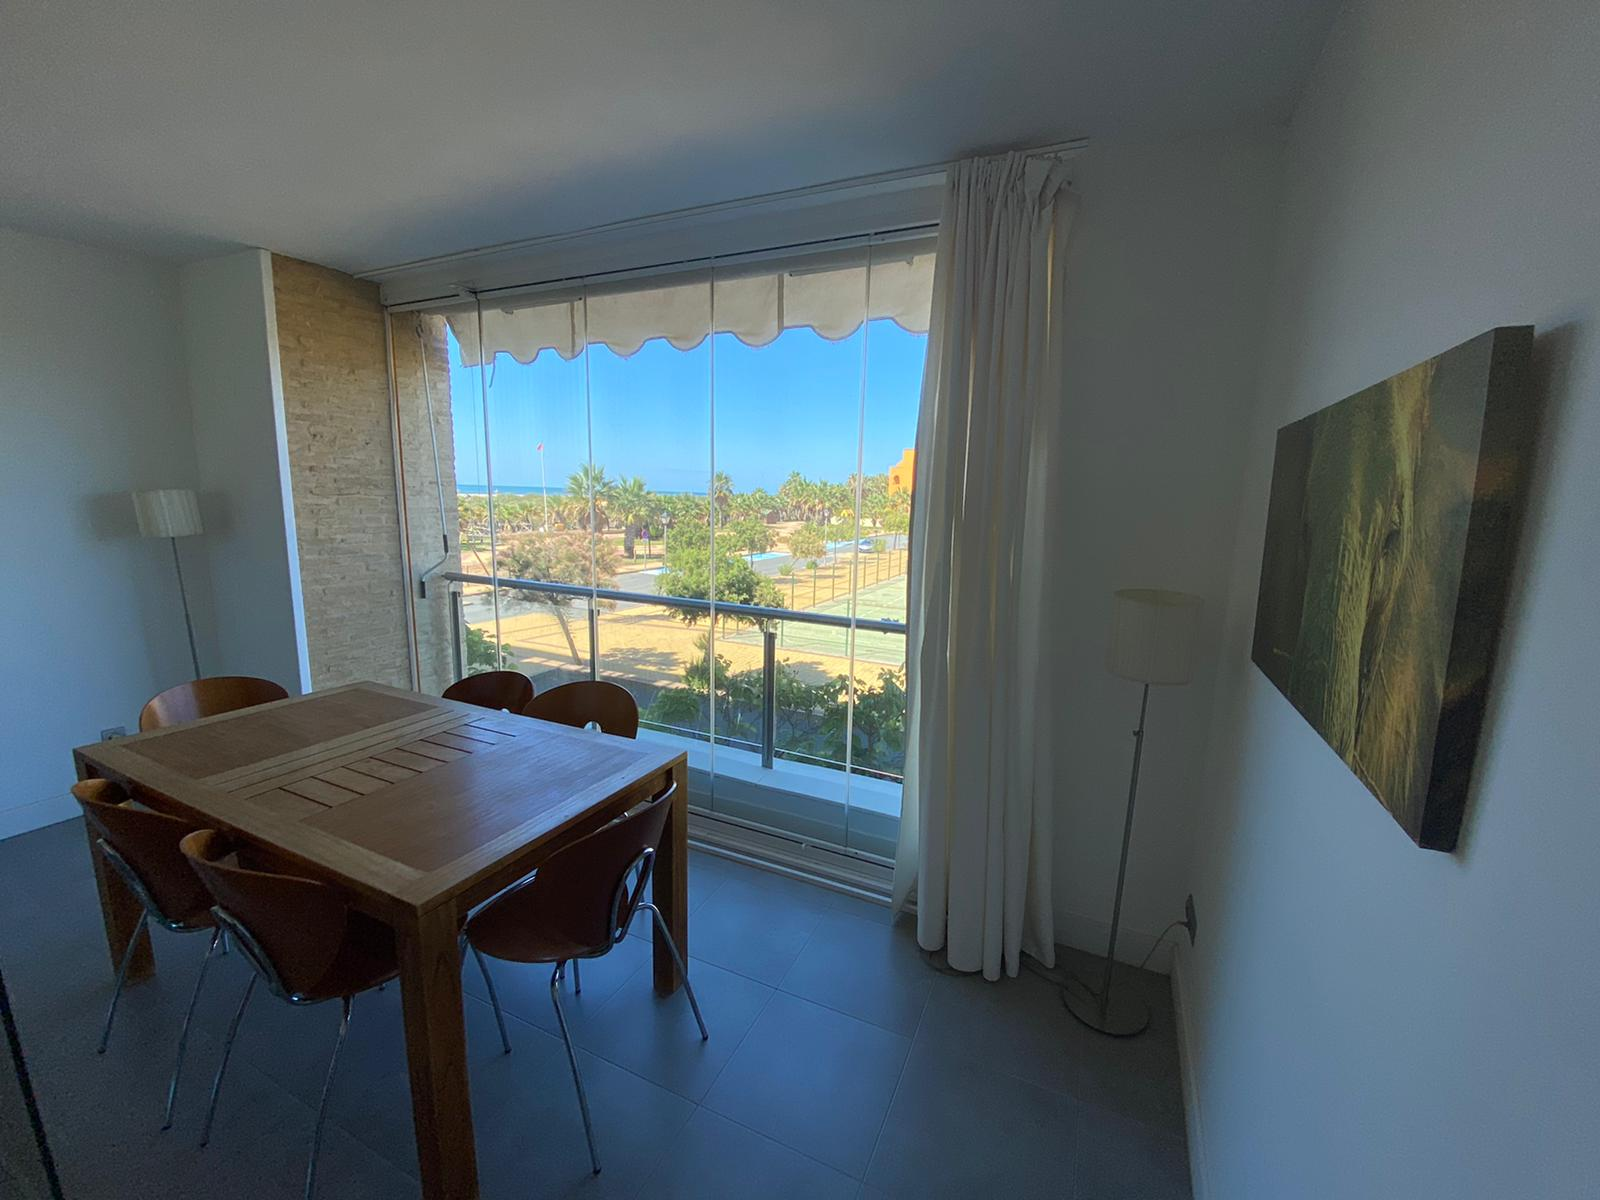 Imagen 14 del Apartamento en El Espigón, 1ª Planta nº4 Poniente (3d+2b), Punta del Moral (HUELVA), Paseo de la Cruz nº22